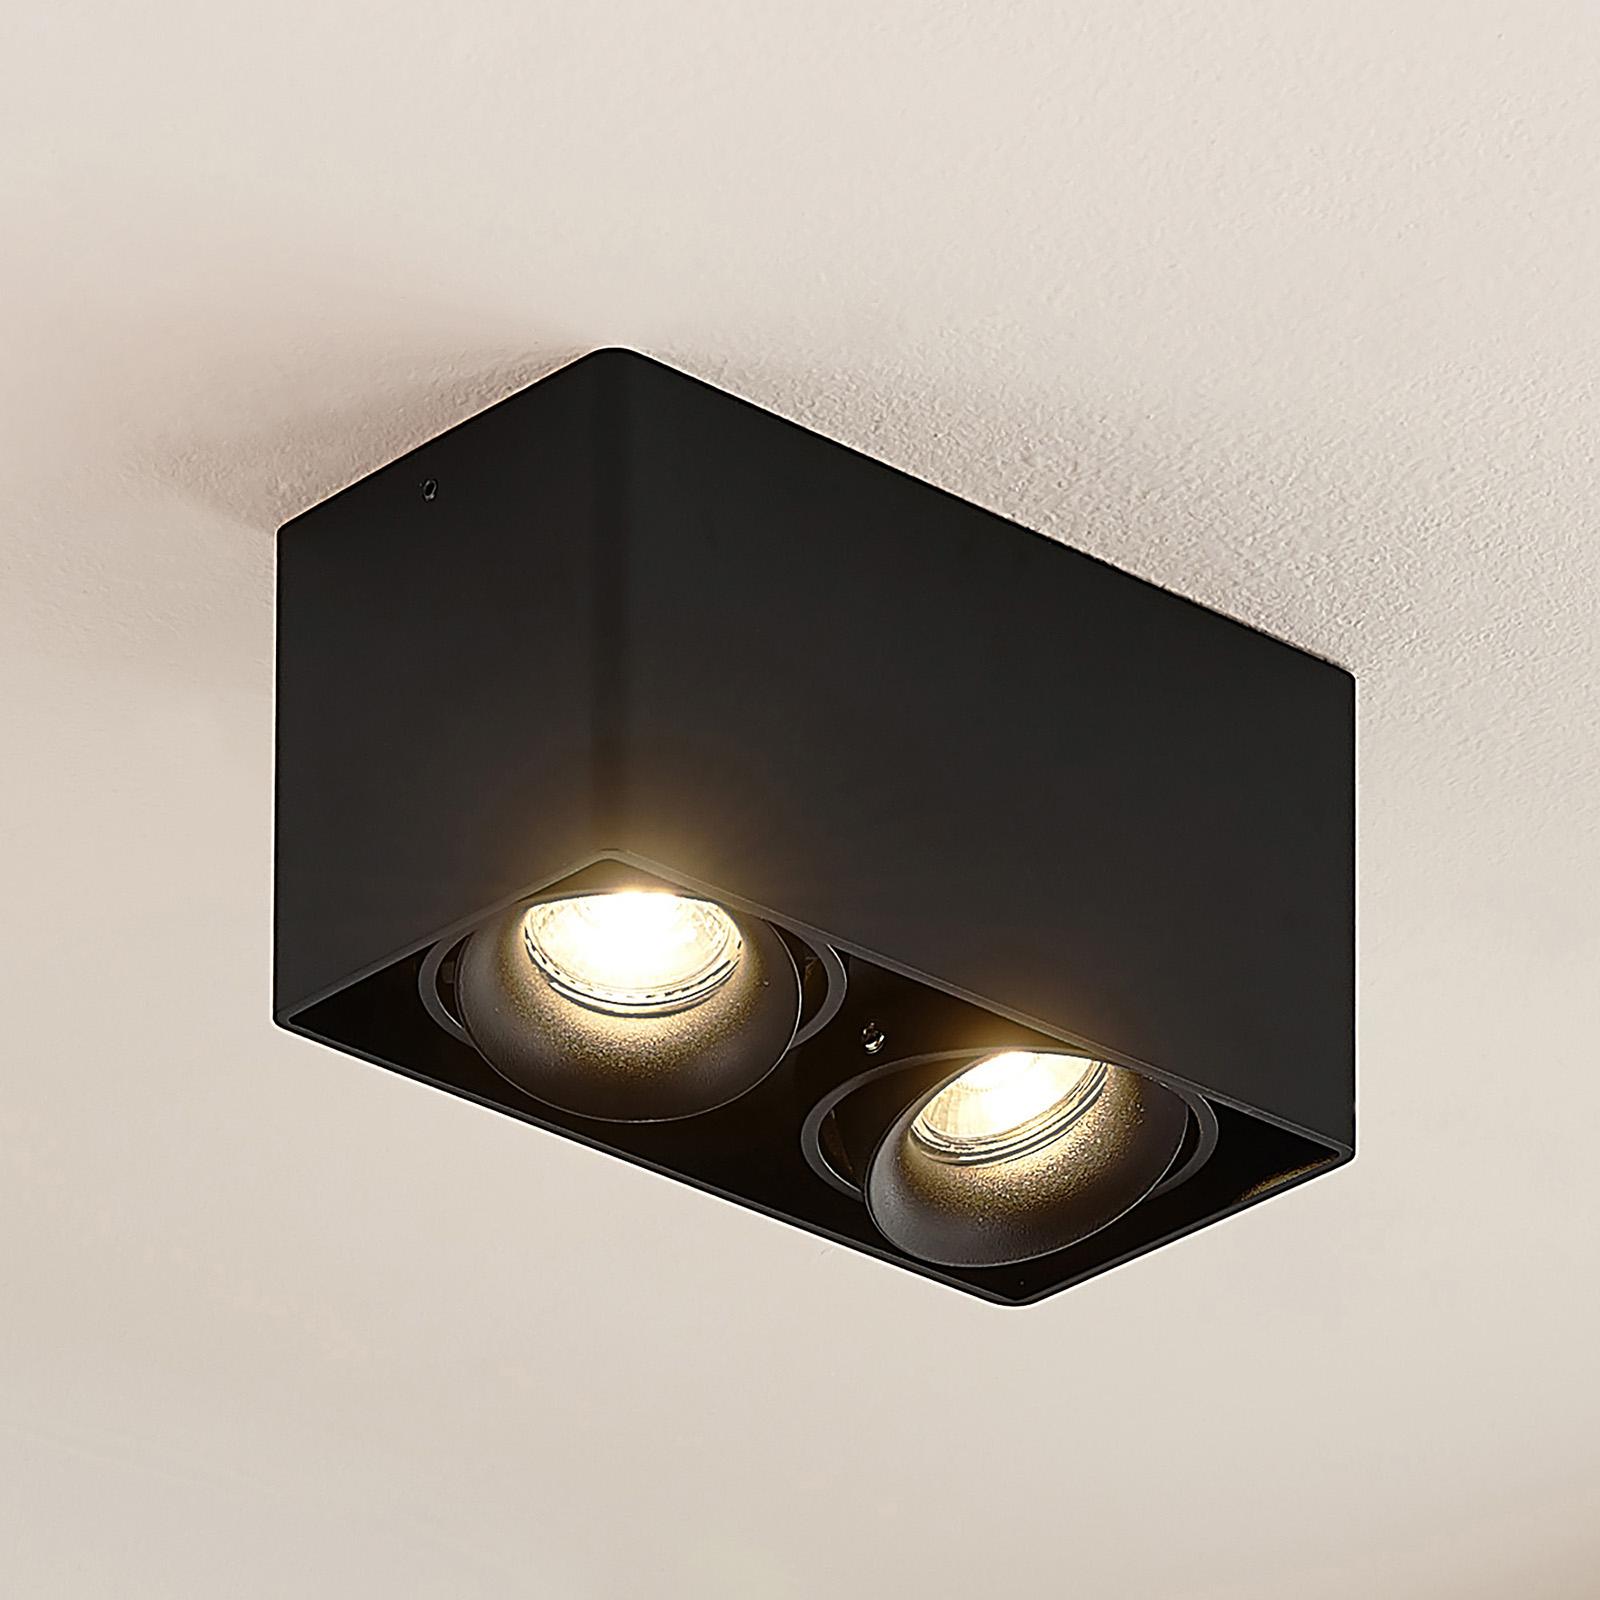 Arcchio Kubika downlight GU10, 2 luces, negro